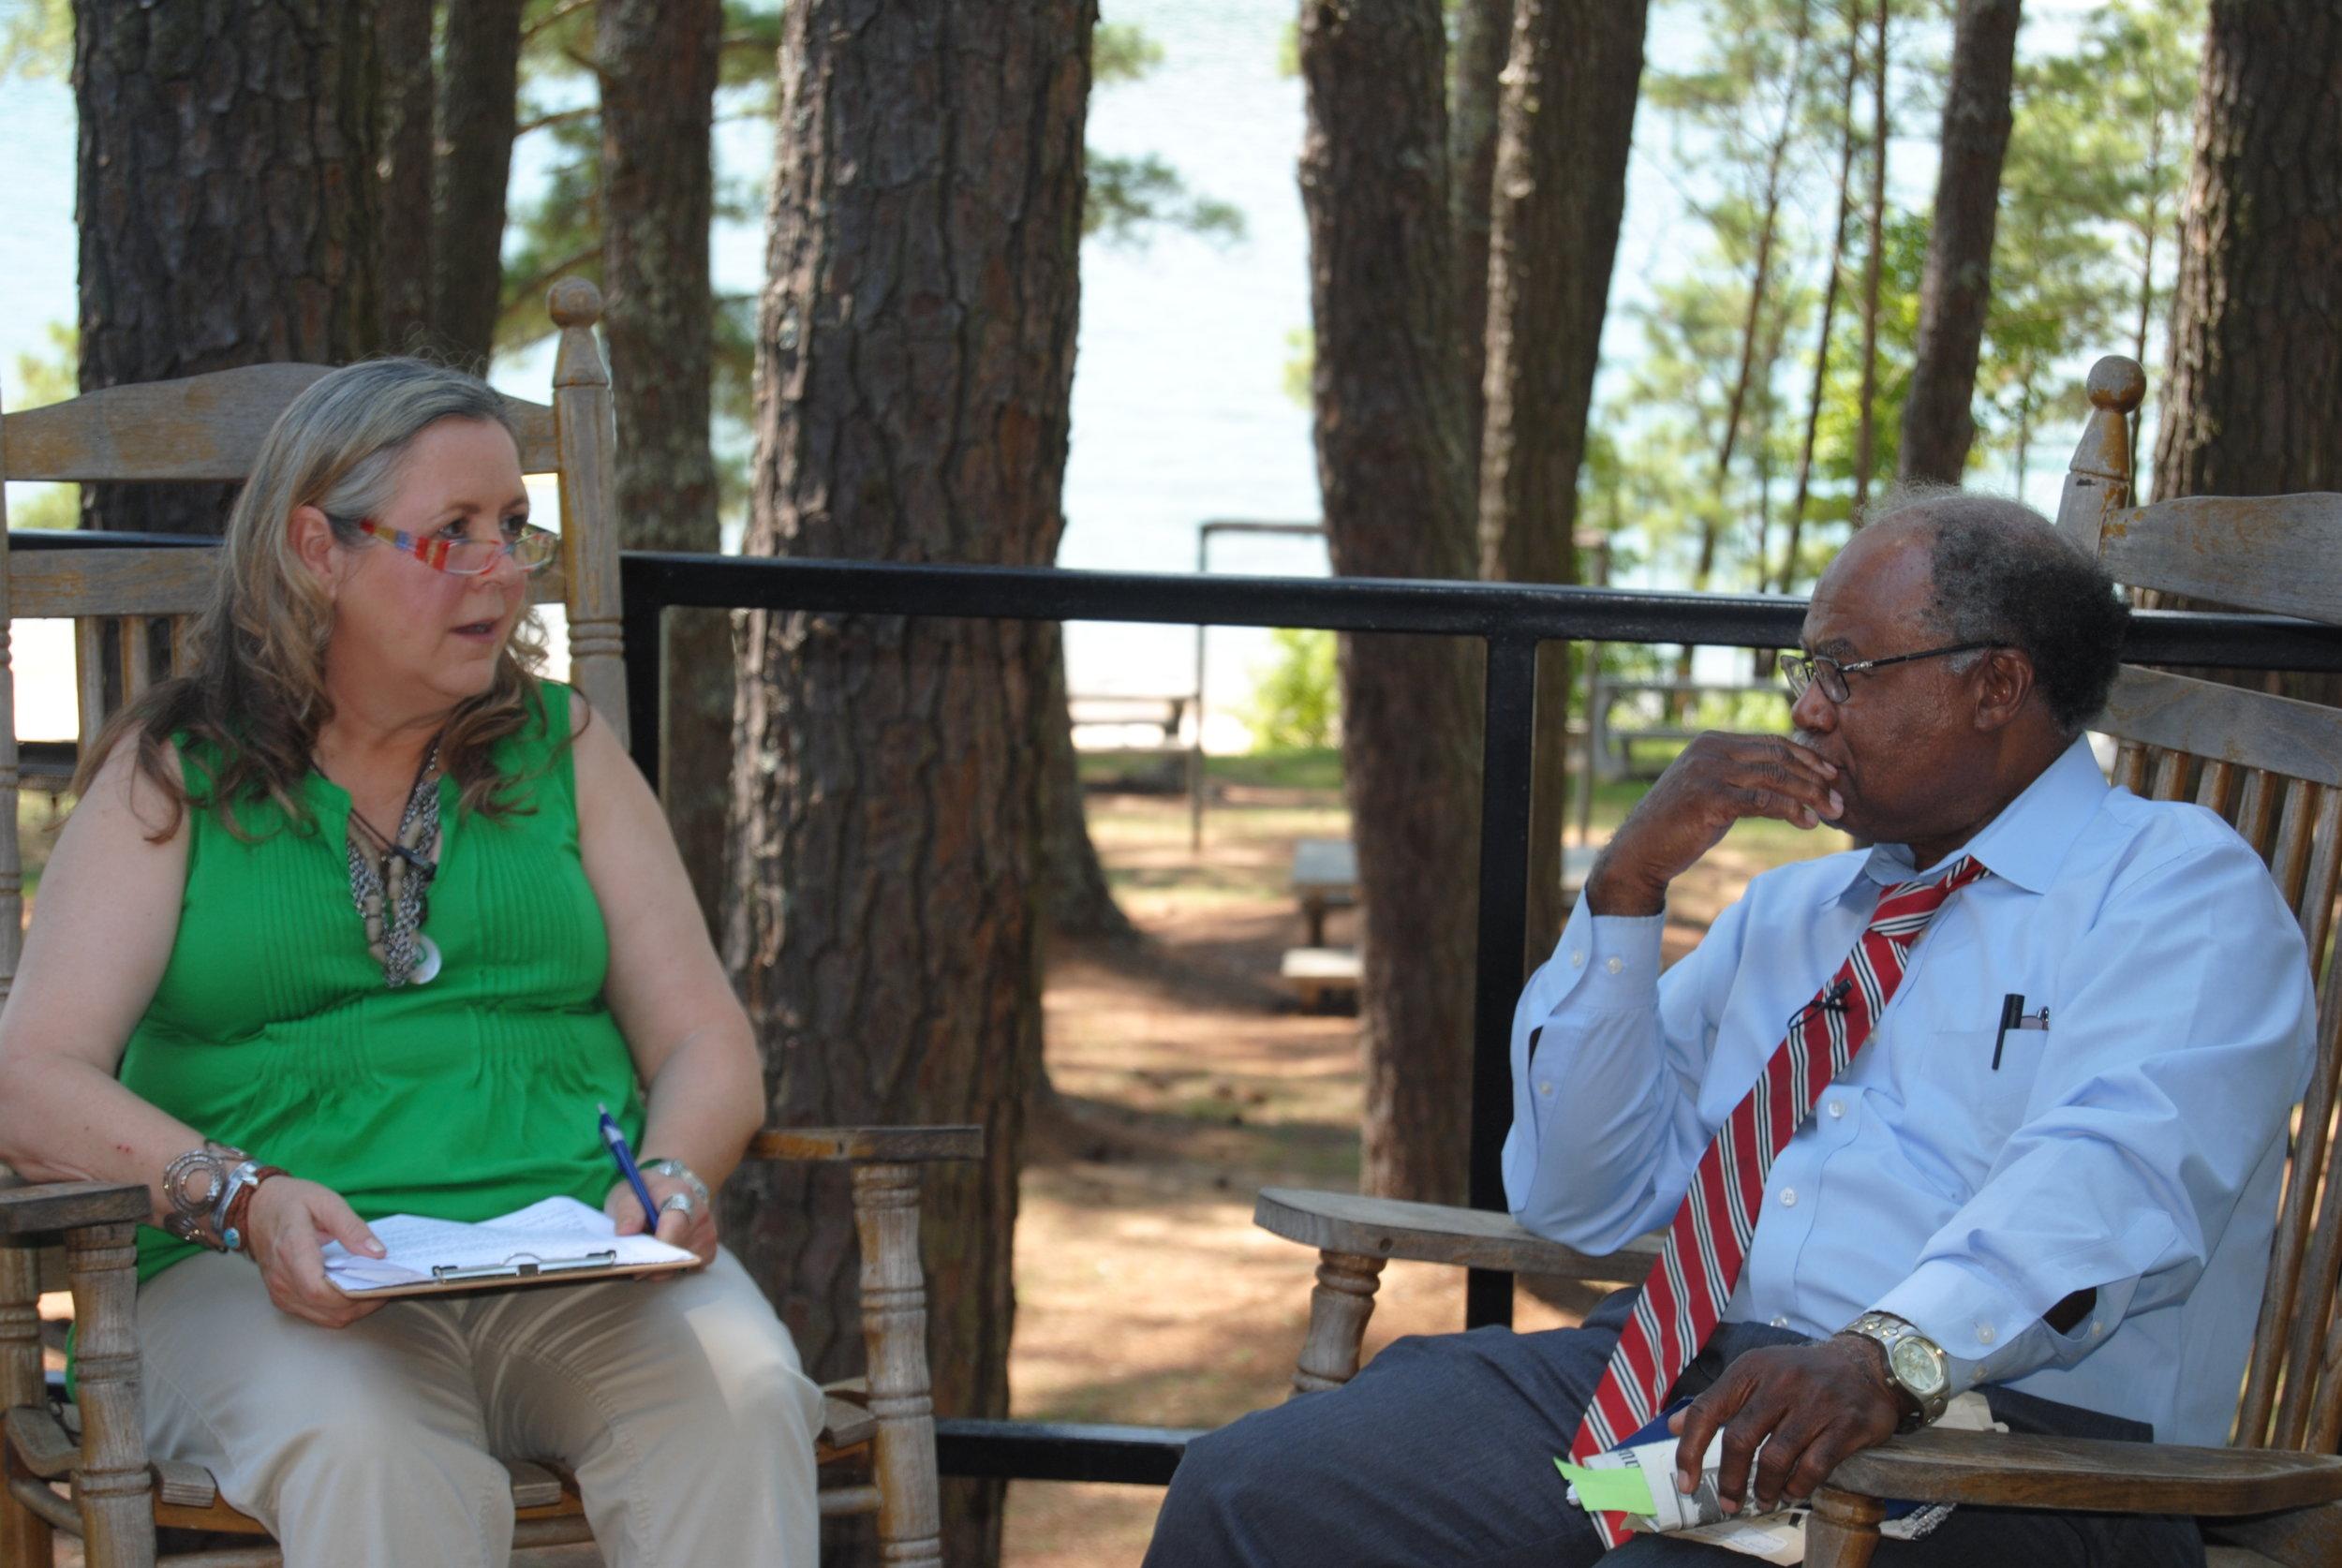 Sheri interviewing Justice Robert Benham at George Washington Carver Park